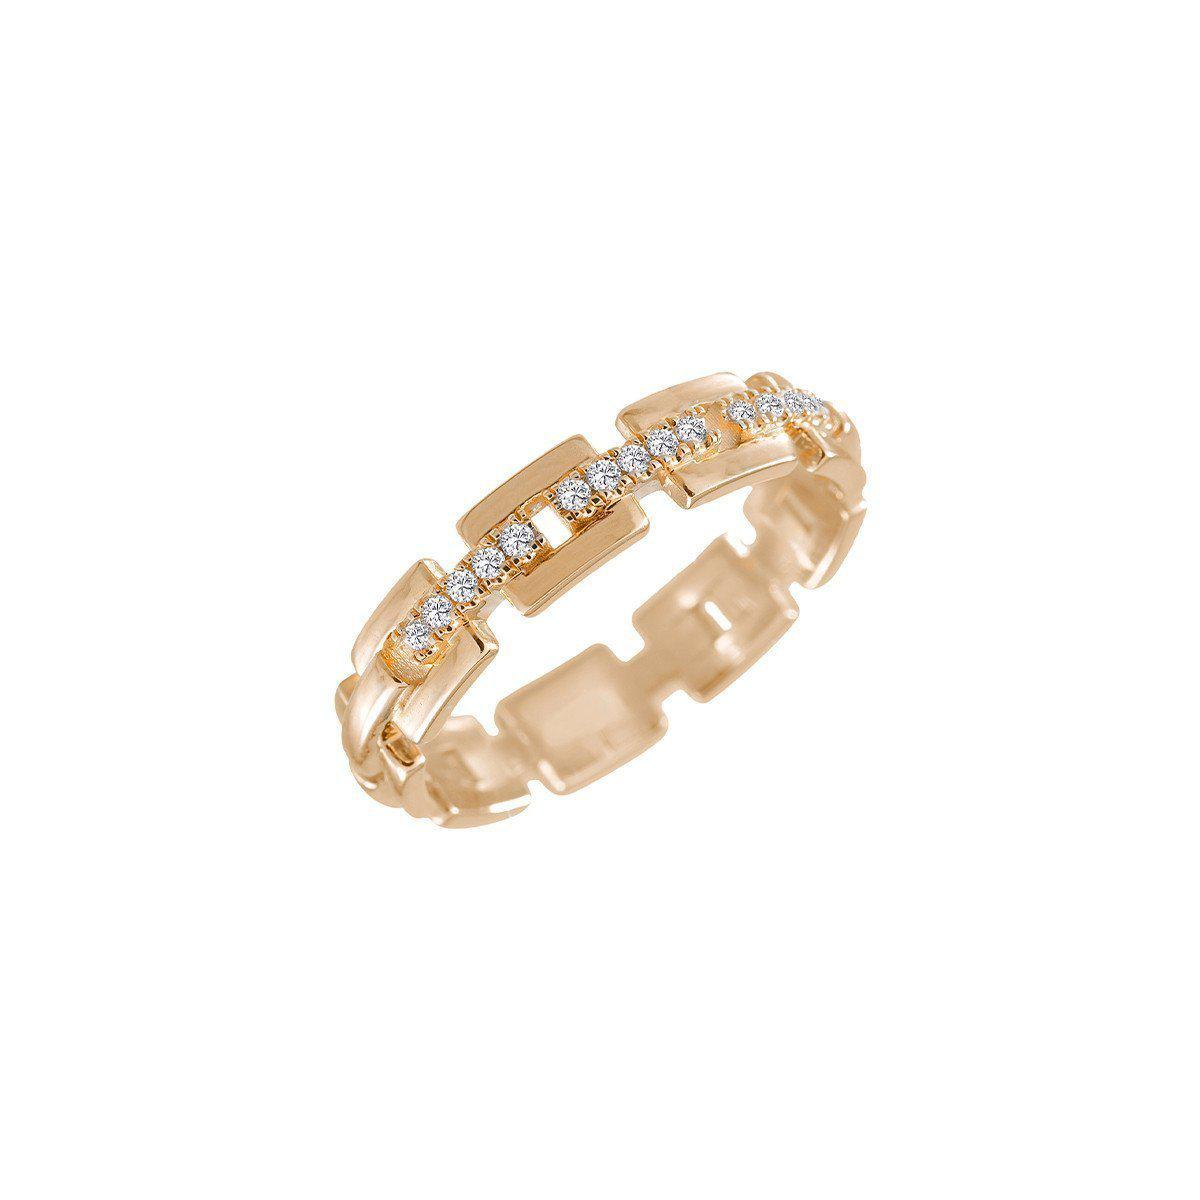 Jezebel London 14kt Rose Gold & Diamond Margaret Ring - UK M - US 6 - EU 52 3/4 LdYreLzc